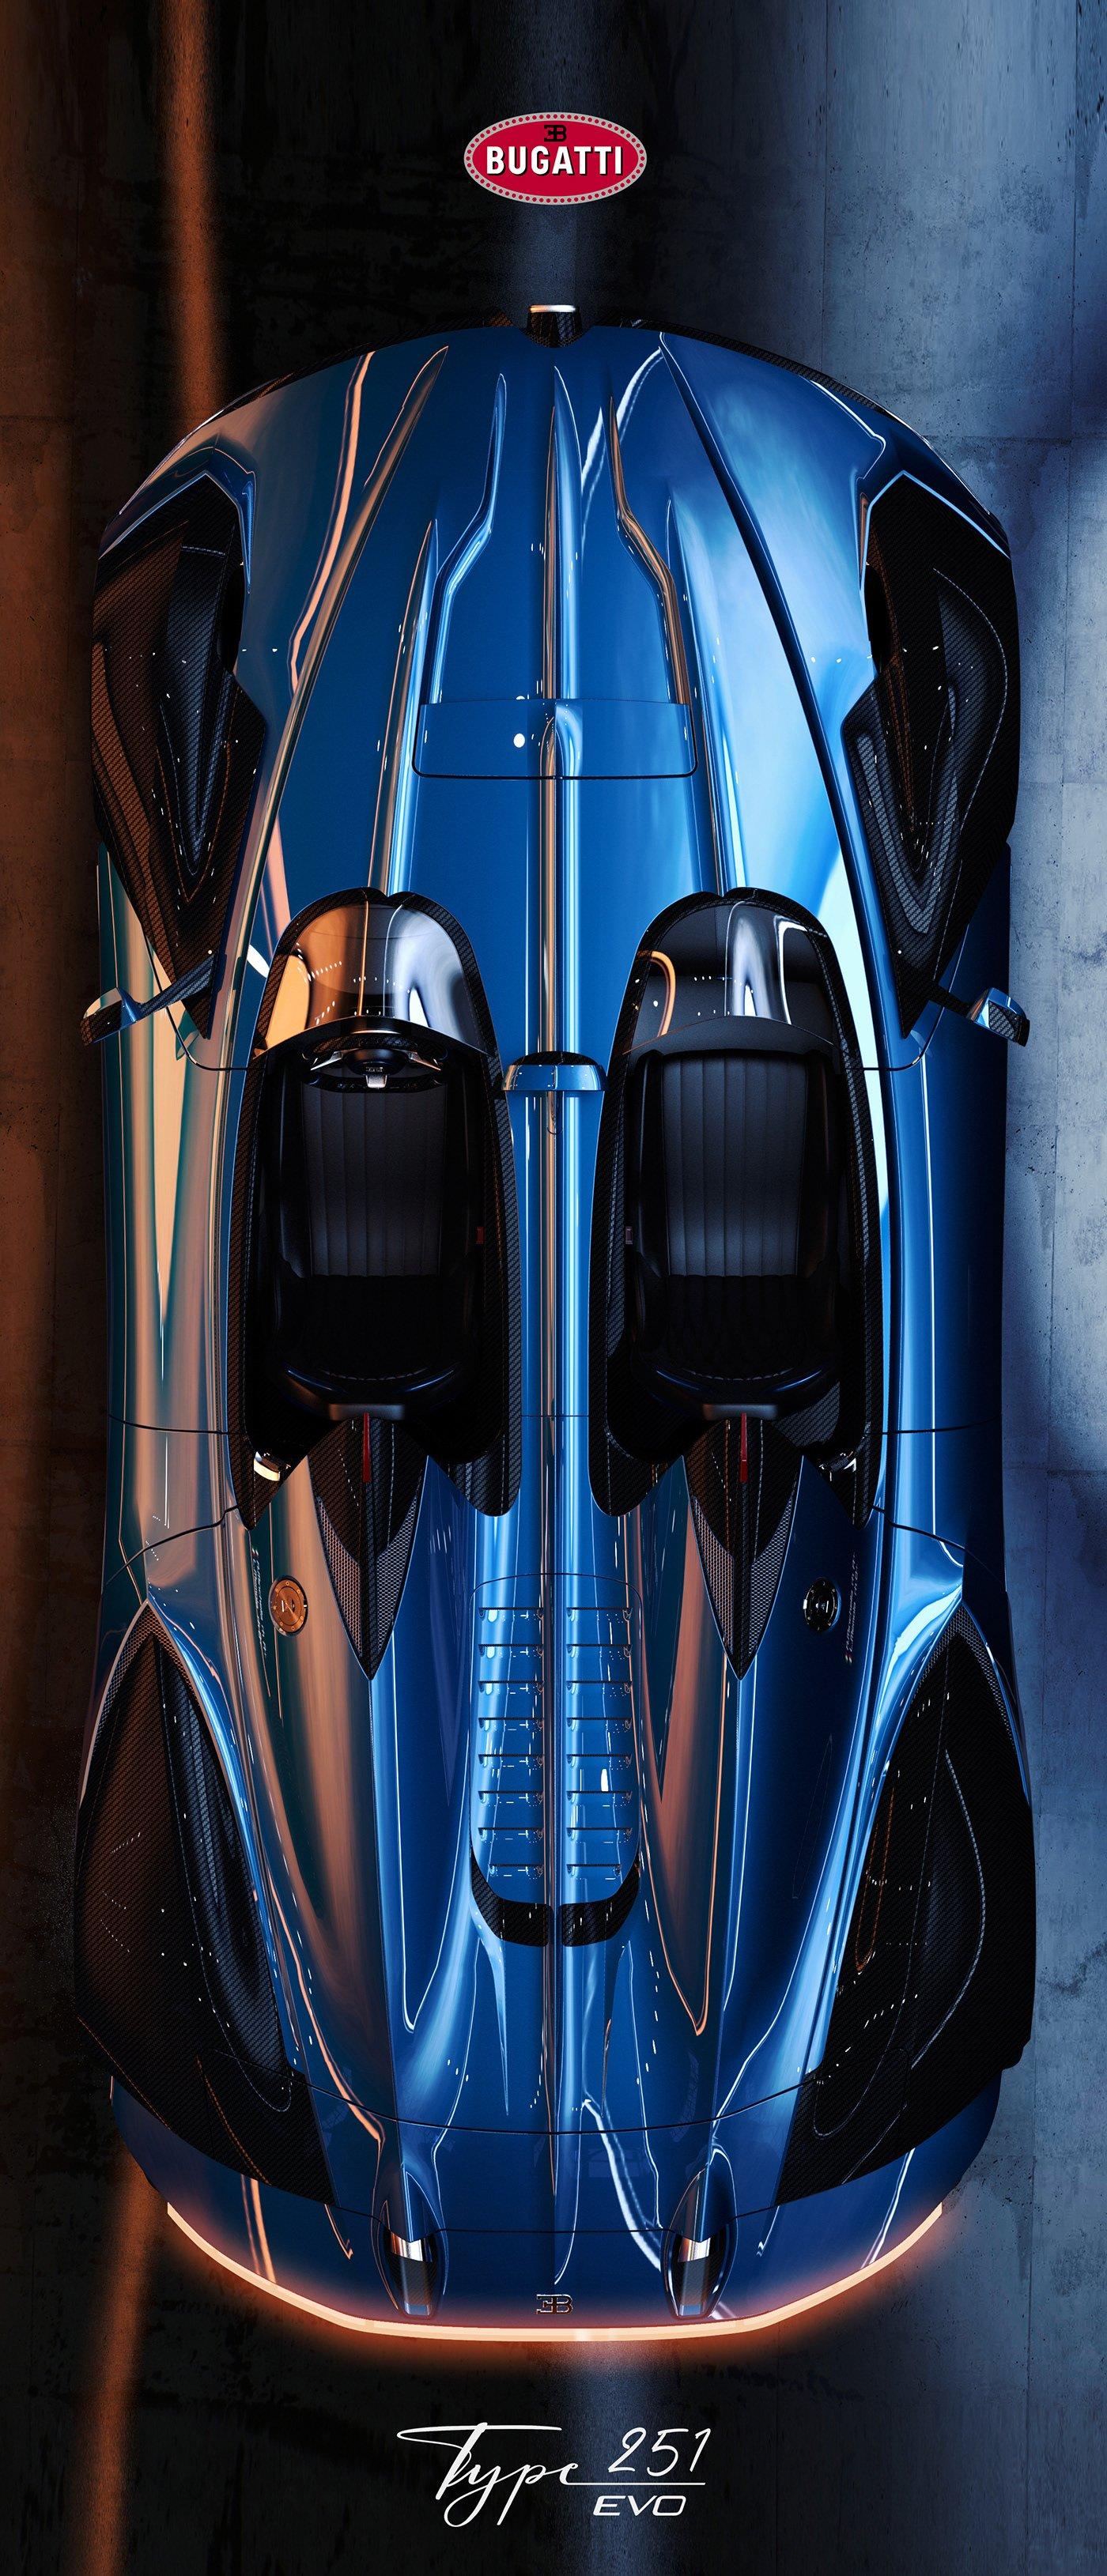 luigi-memola-alessio-minchella-2020-bugatti-251-EVO-keyshot-09